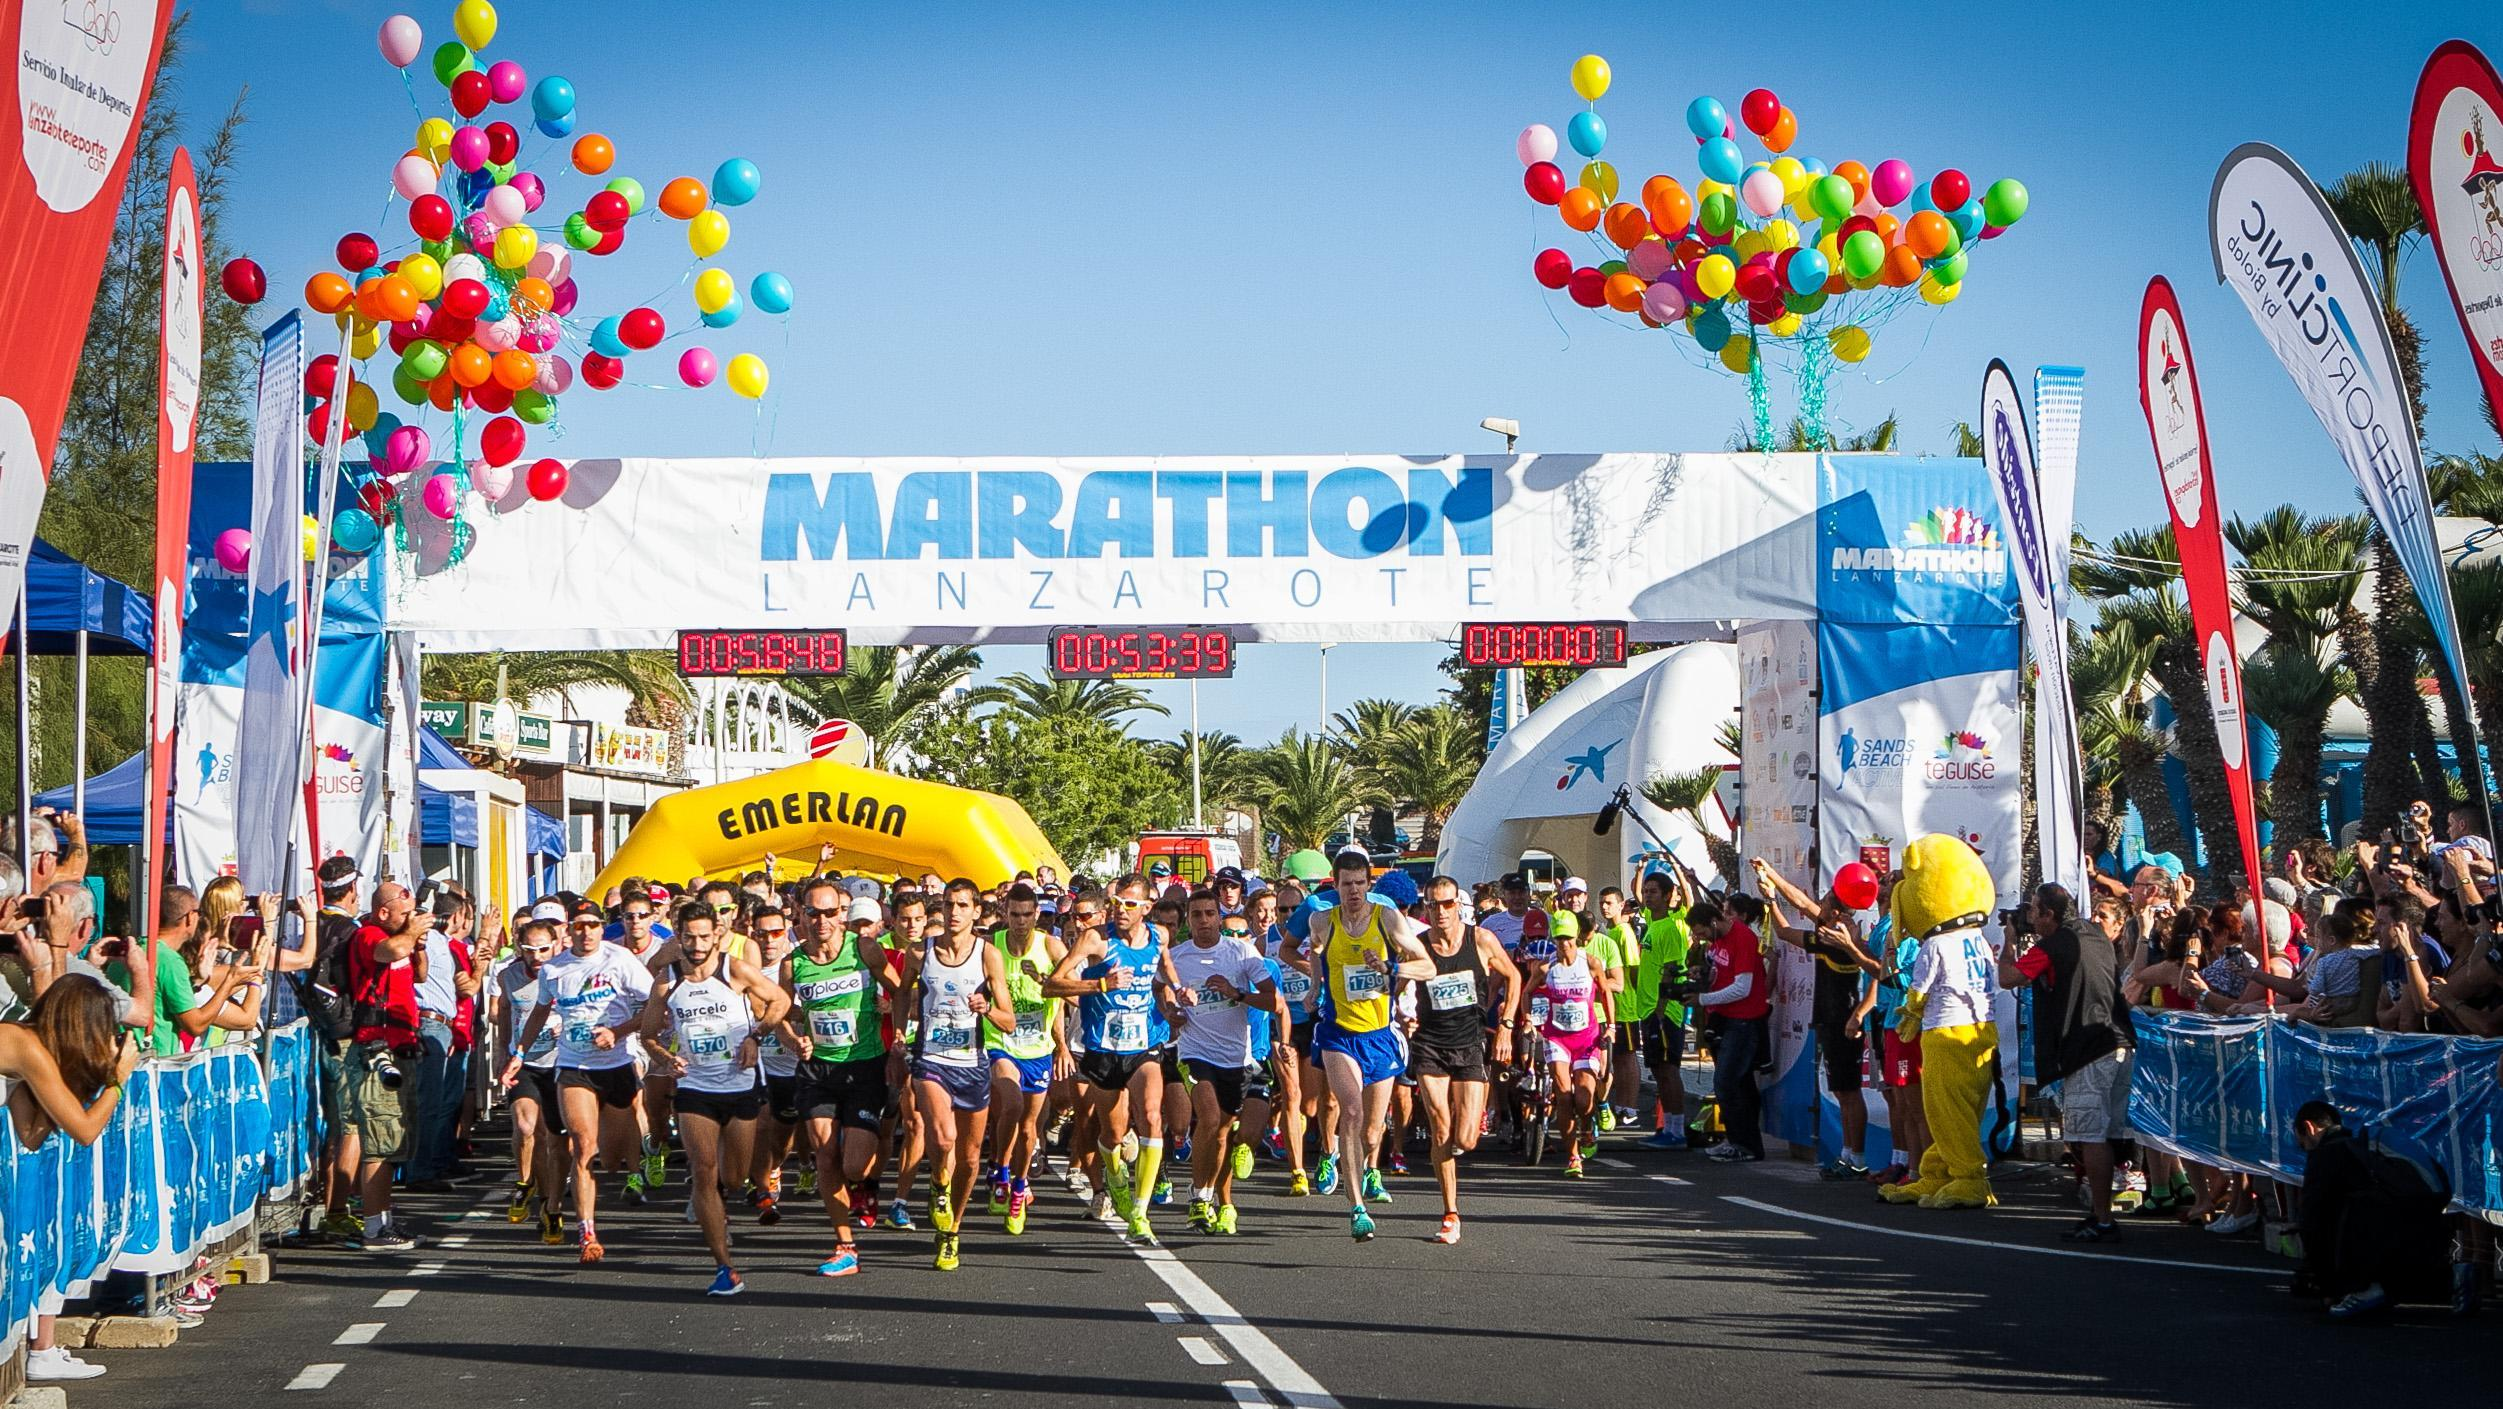 foto-3_-maraton-internacional-de-lanzarote-20132